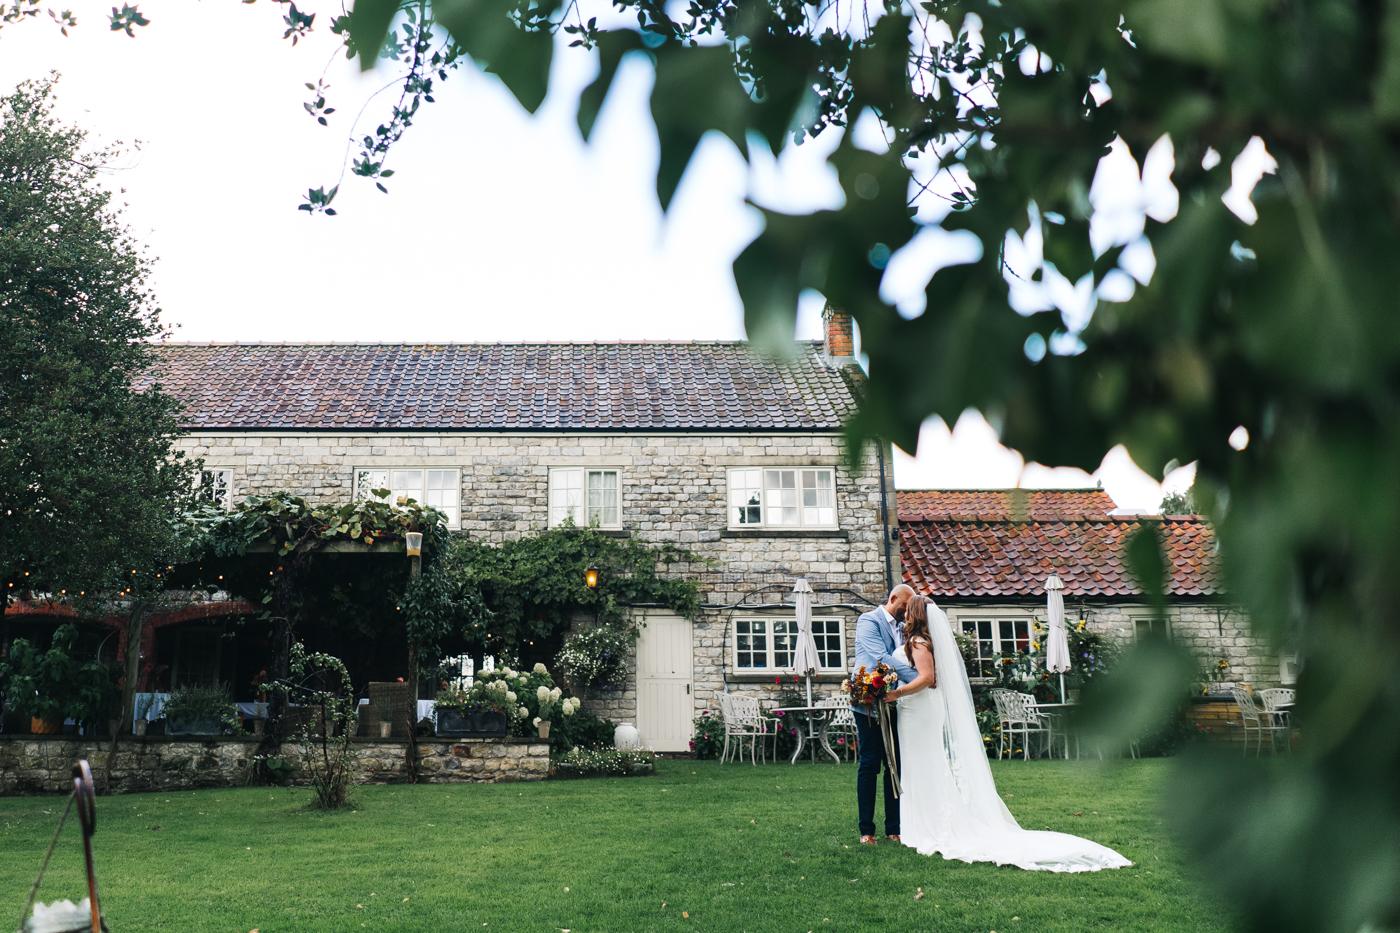 wedding-at-the-pheasant-harome-helmsley-north-yorkshire-wedding-photographer-0031.jpg